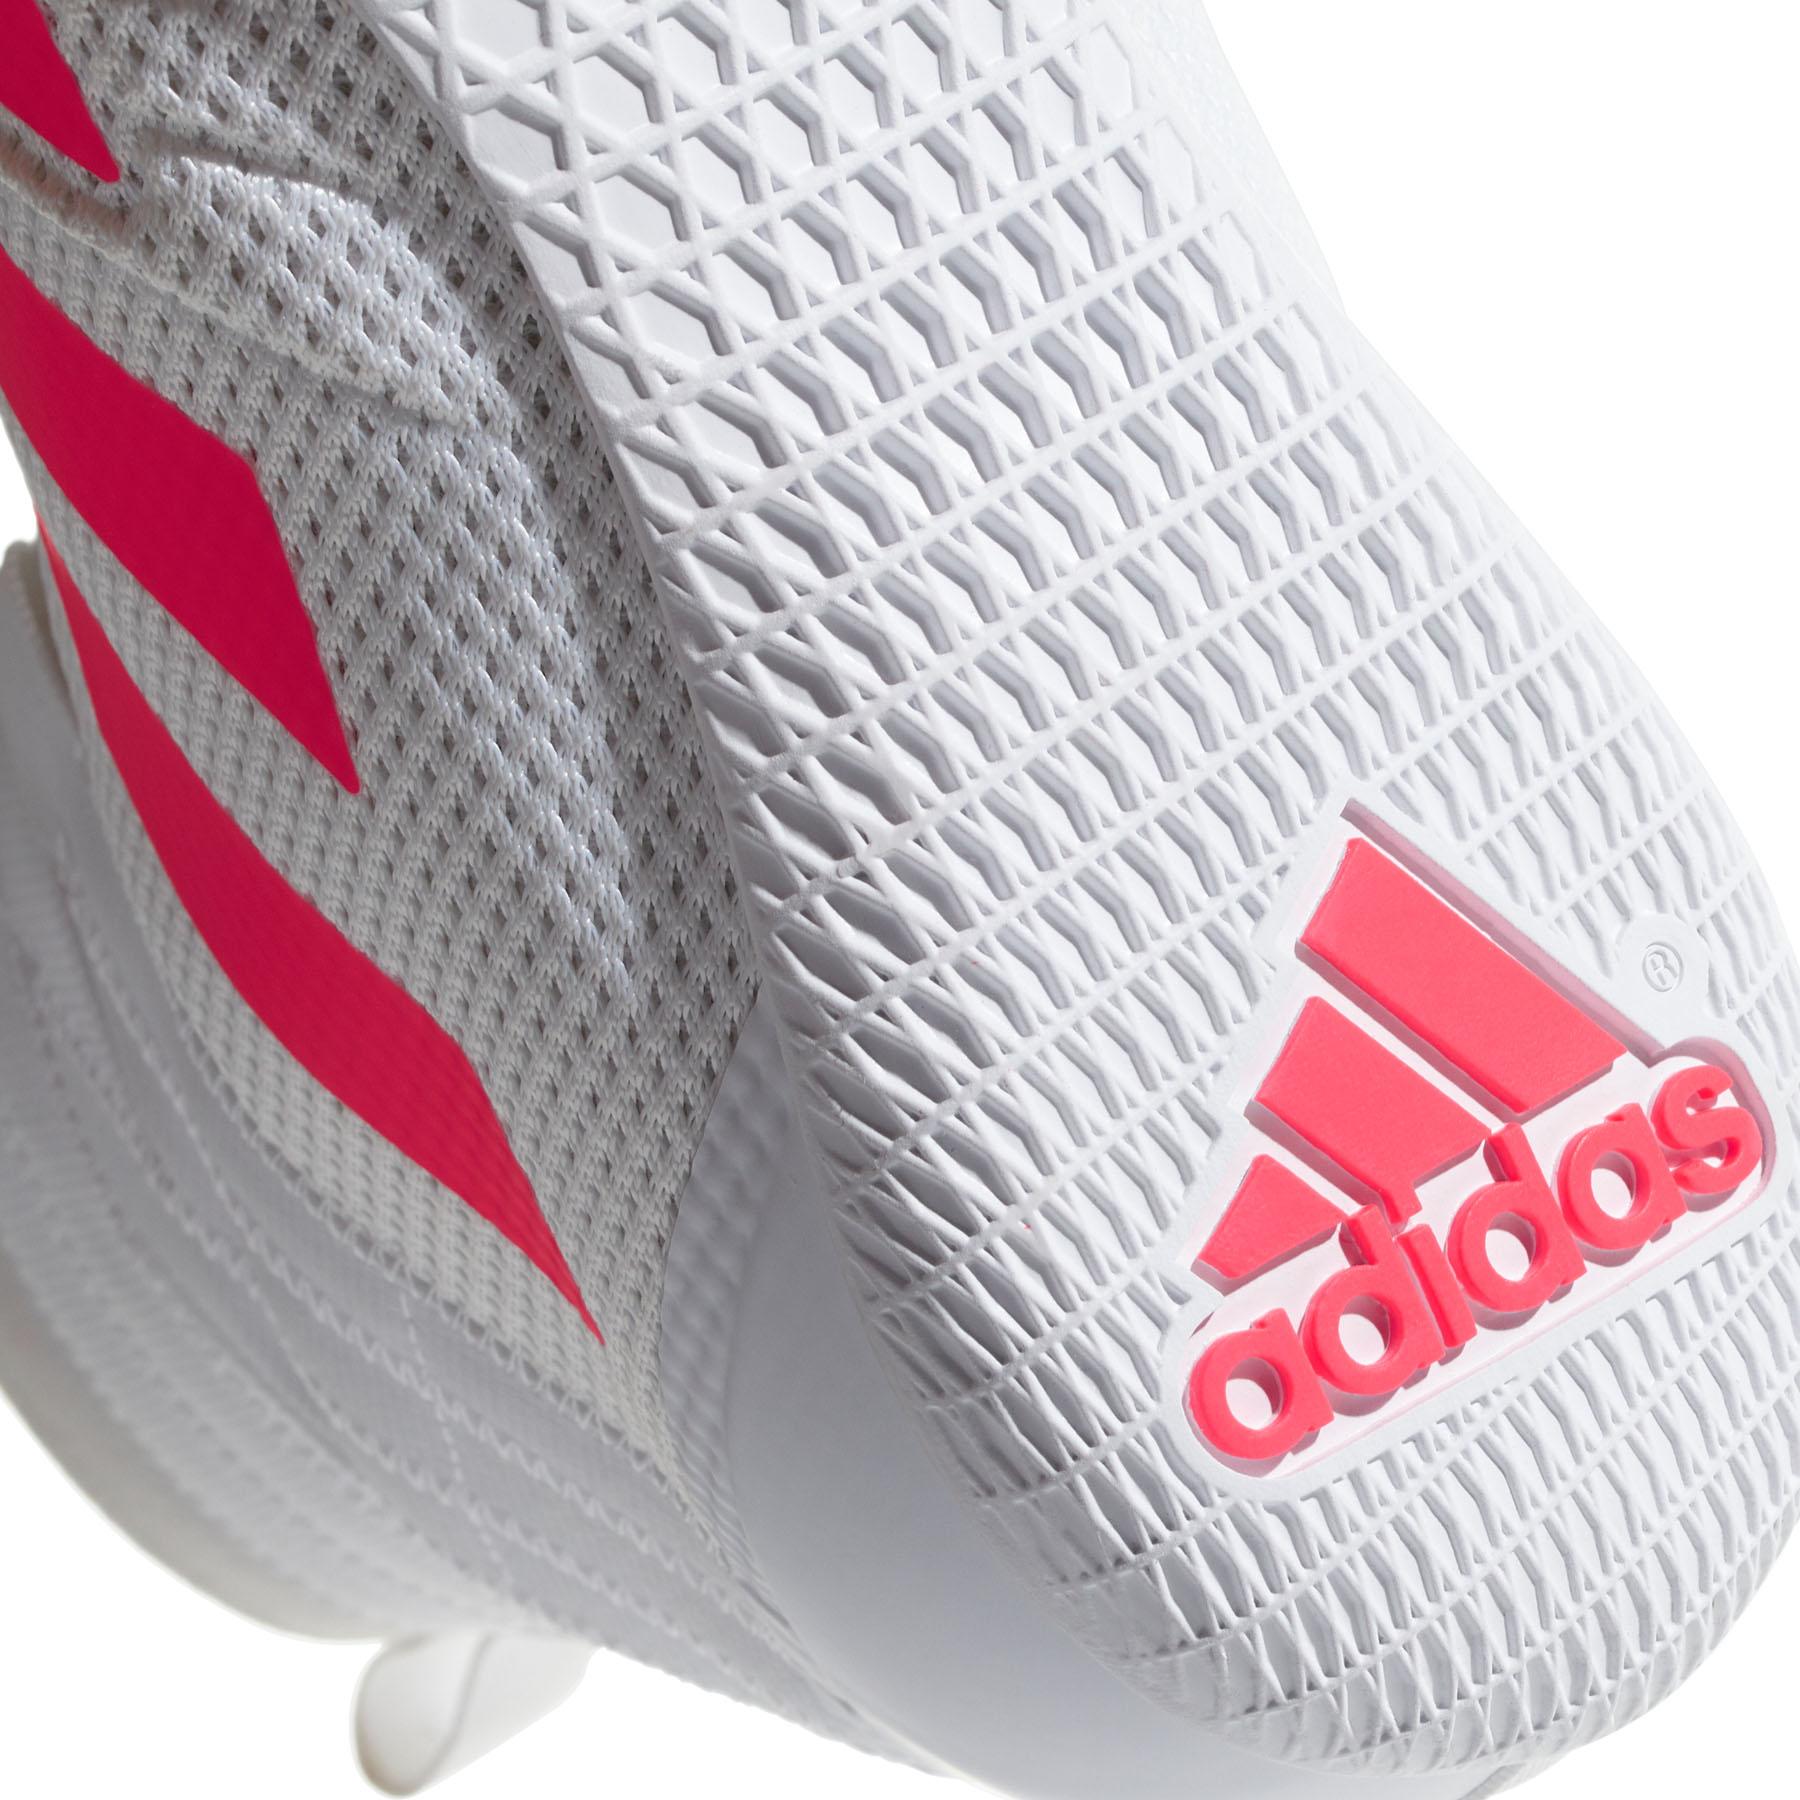 miniature 8 - Adidas speedex 18 Homme Adulte Boxe Trainer Shoe Boot Blanc/Rouge